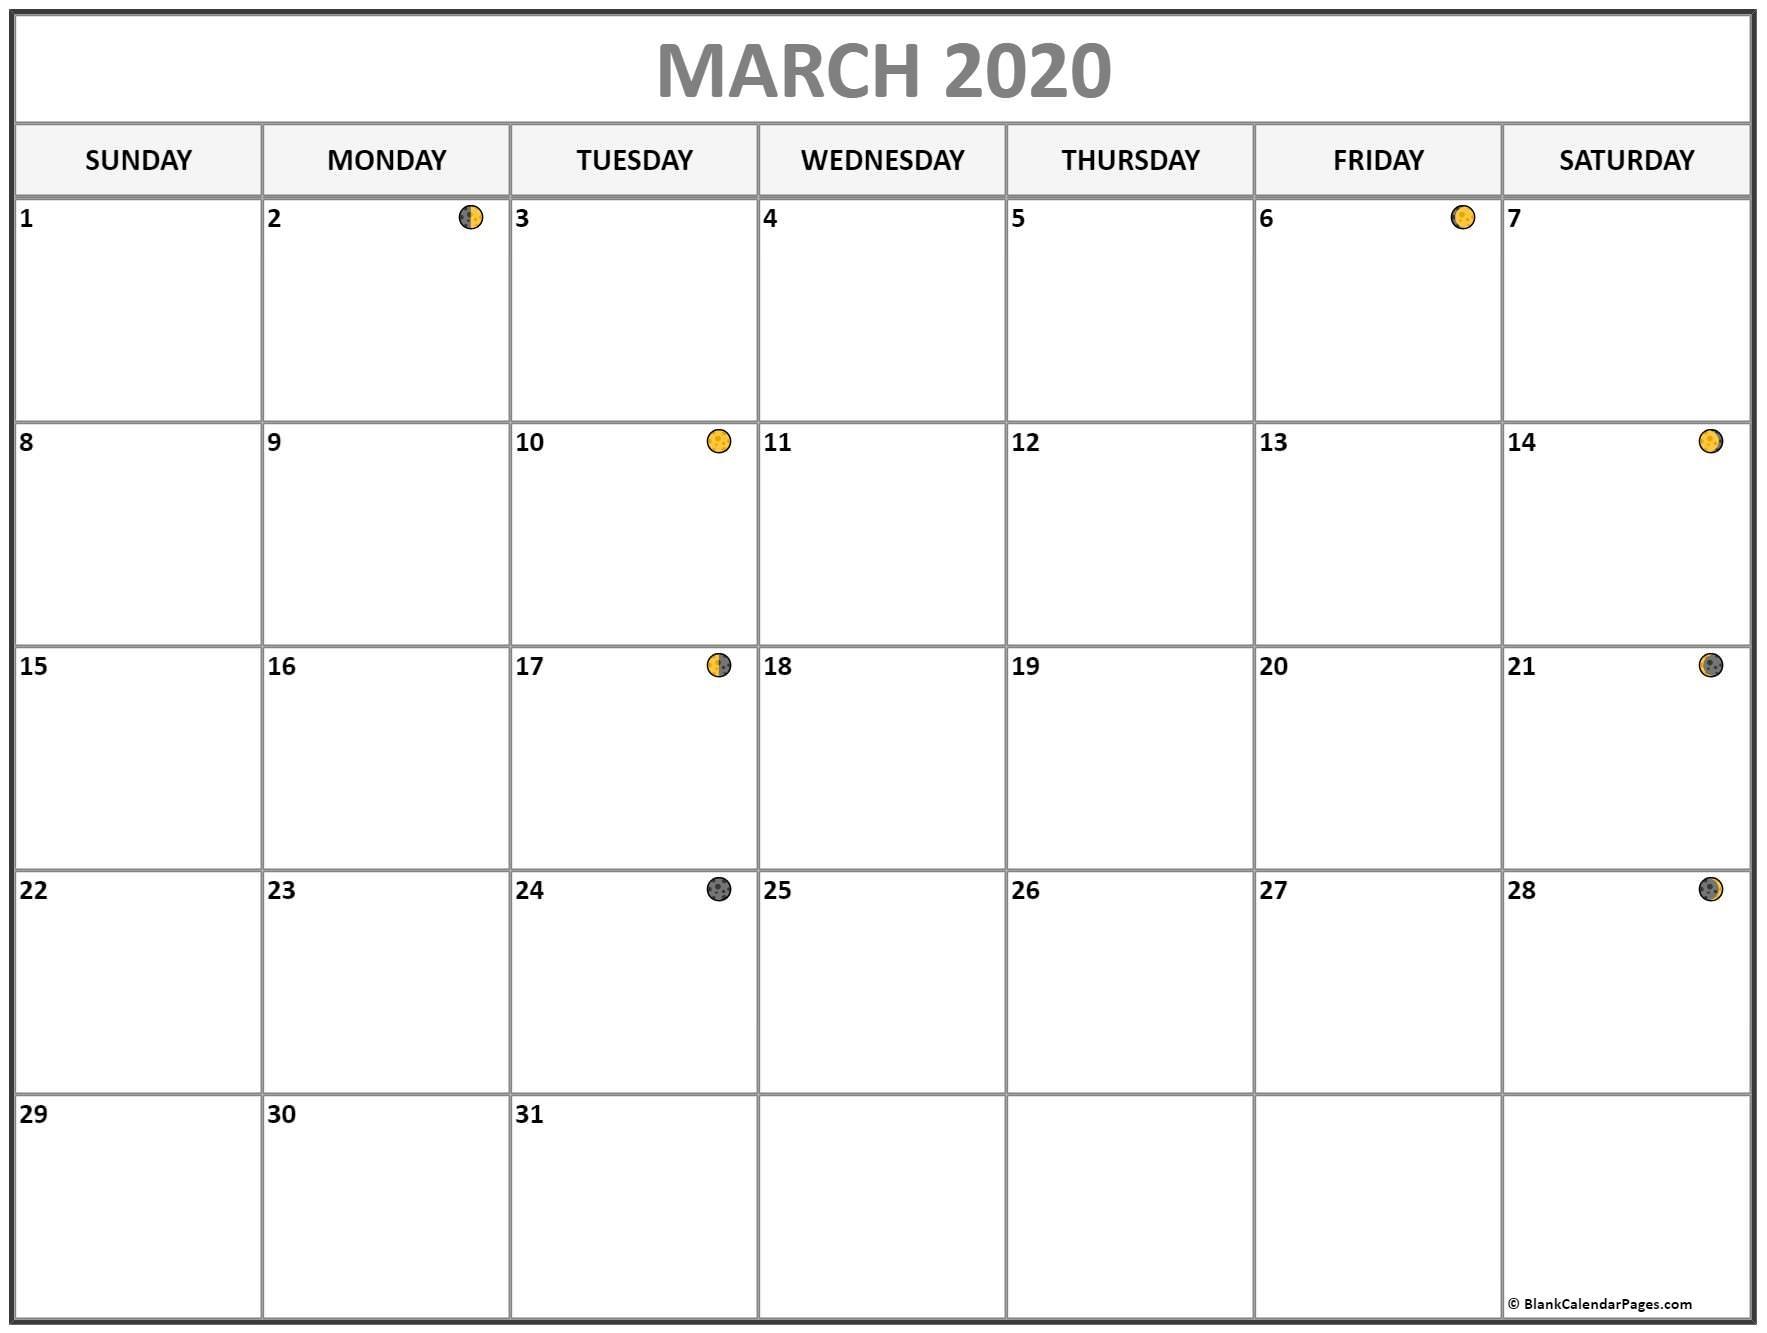 March 2020 Lunar Calendar   Moon Phase Calendar March 2020 Lunar Calendar